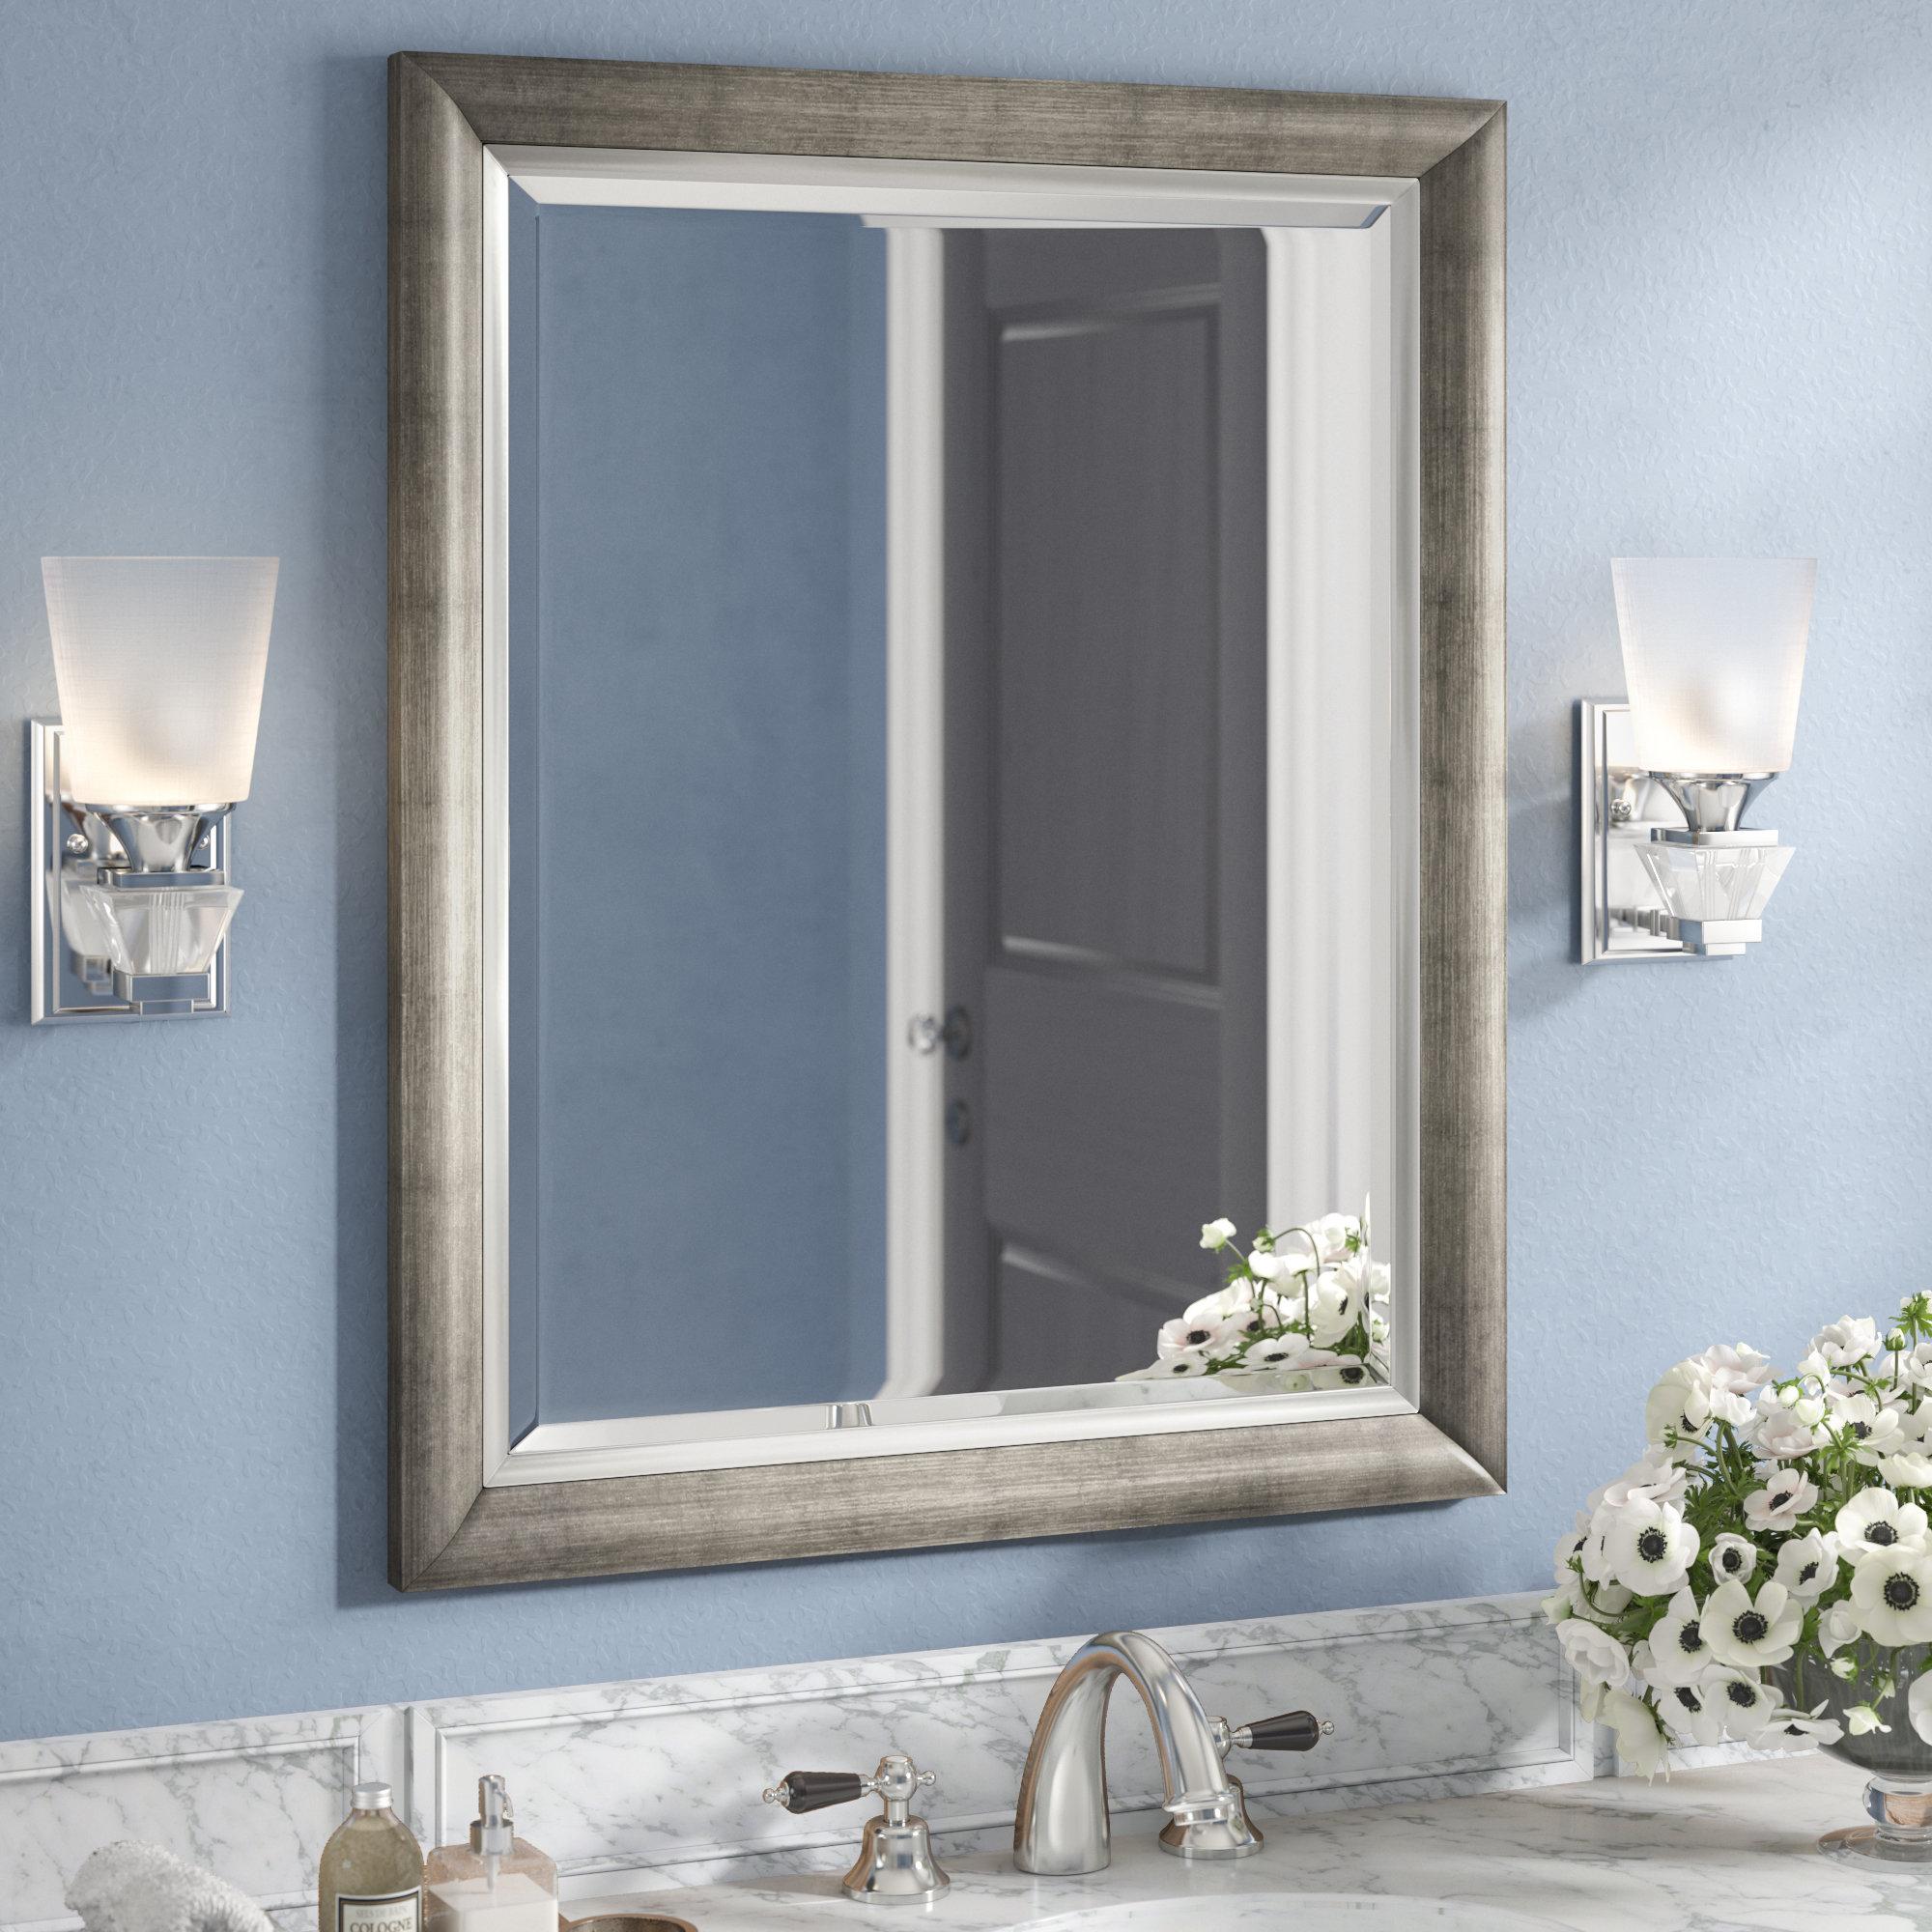 Wall Mirror Regarding Epinal Shabby Elegance Wall Mirrors (View 11 of 20)